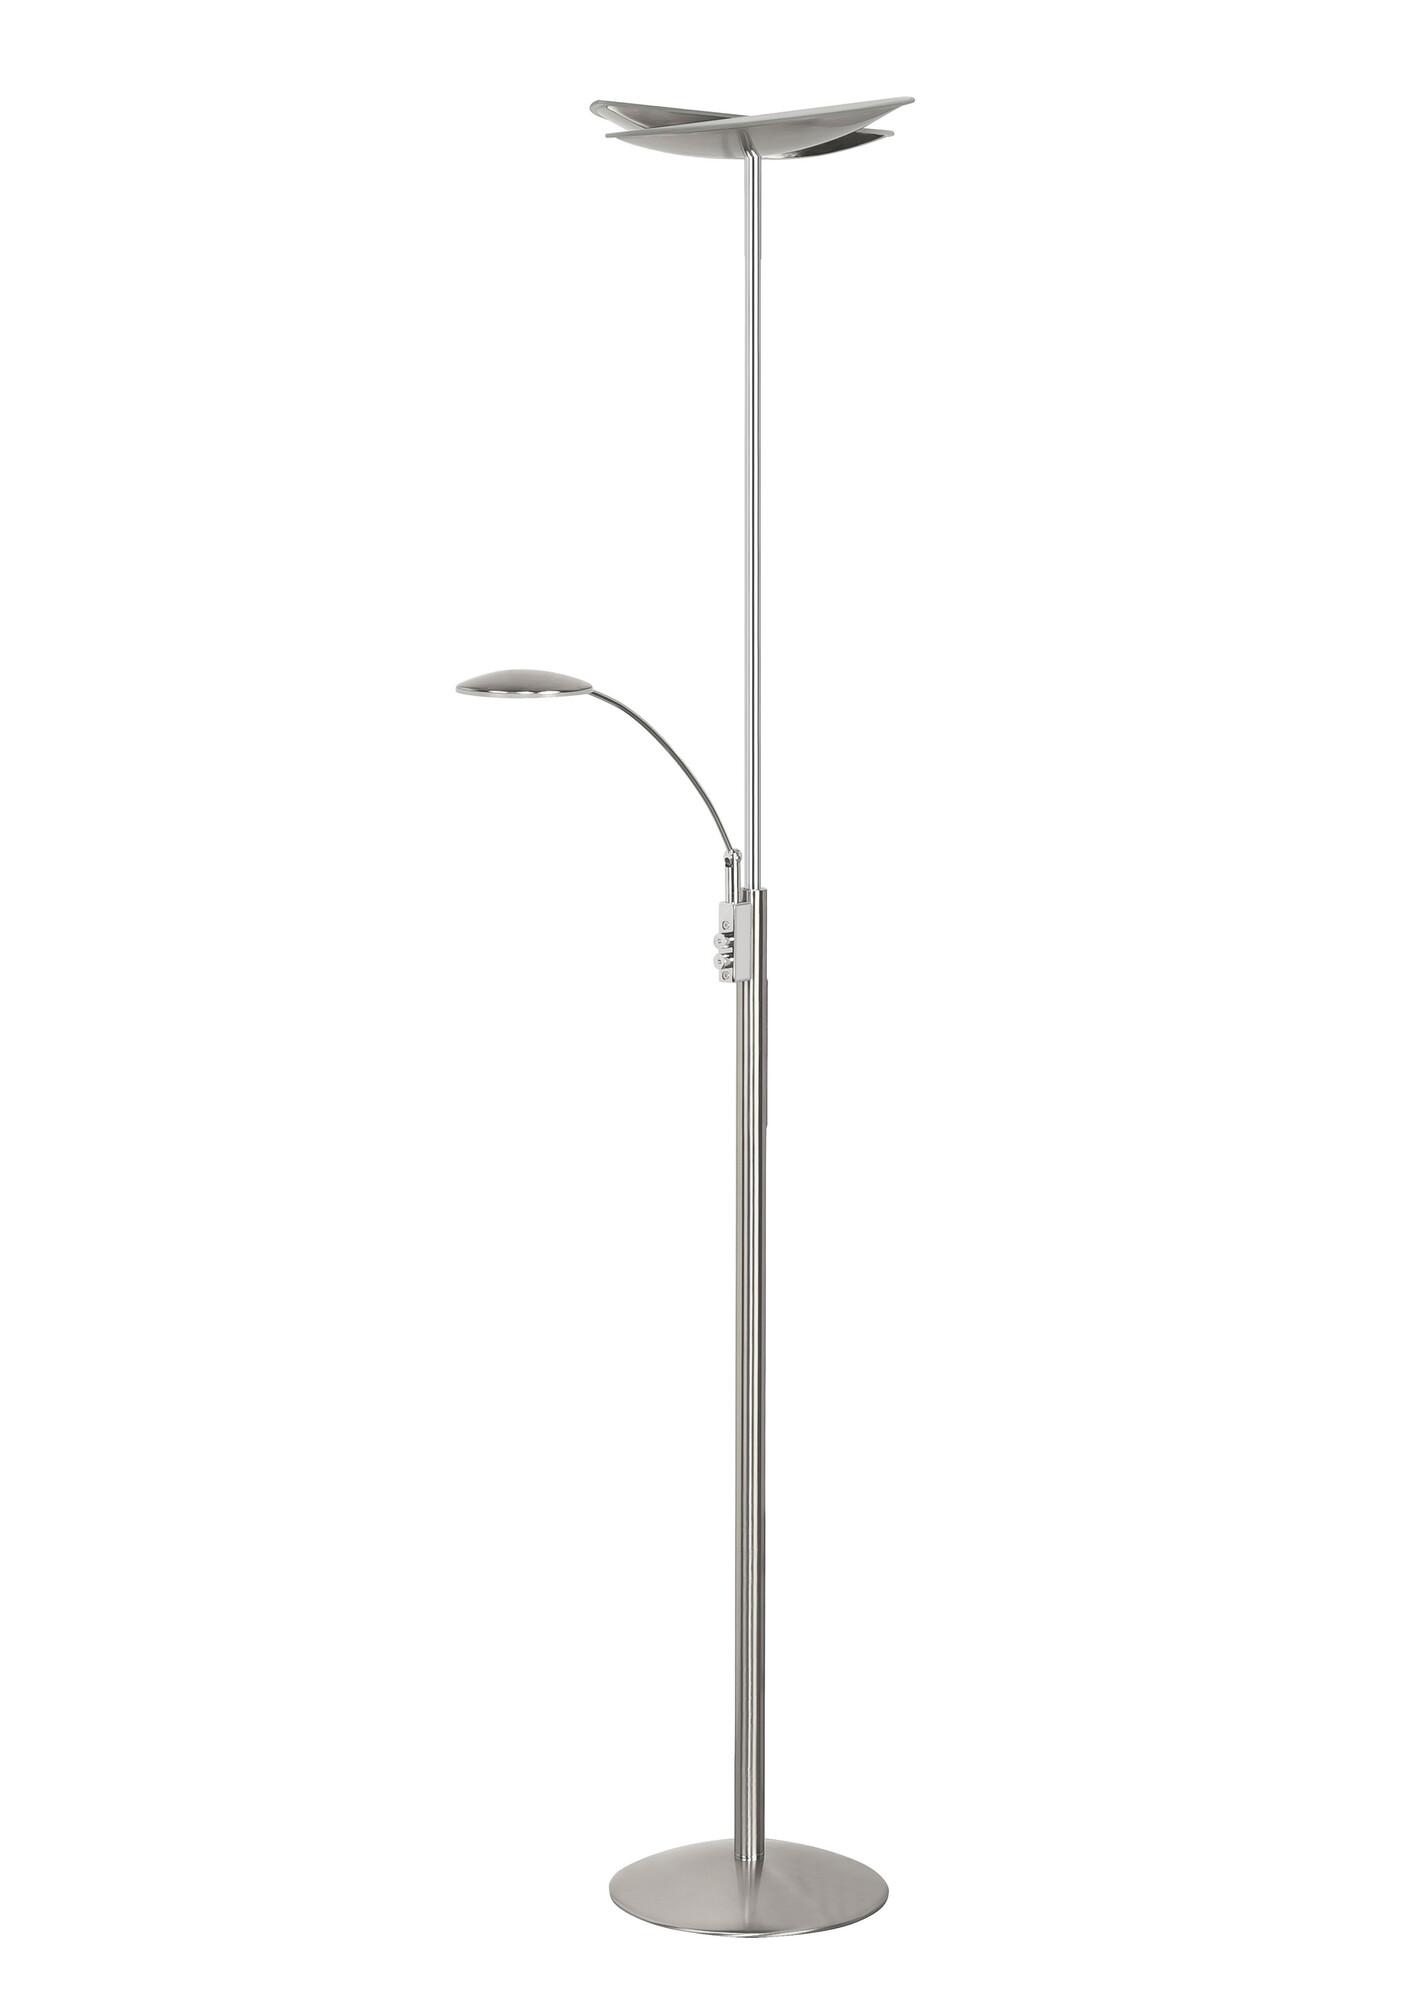 SAPPORO Lampadaire LED 2x24W/2800lm Argent